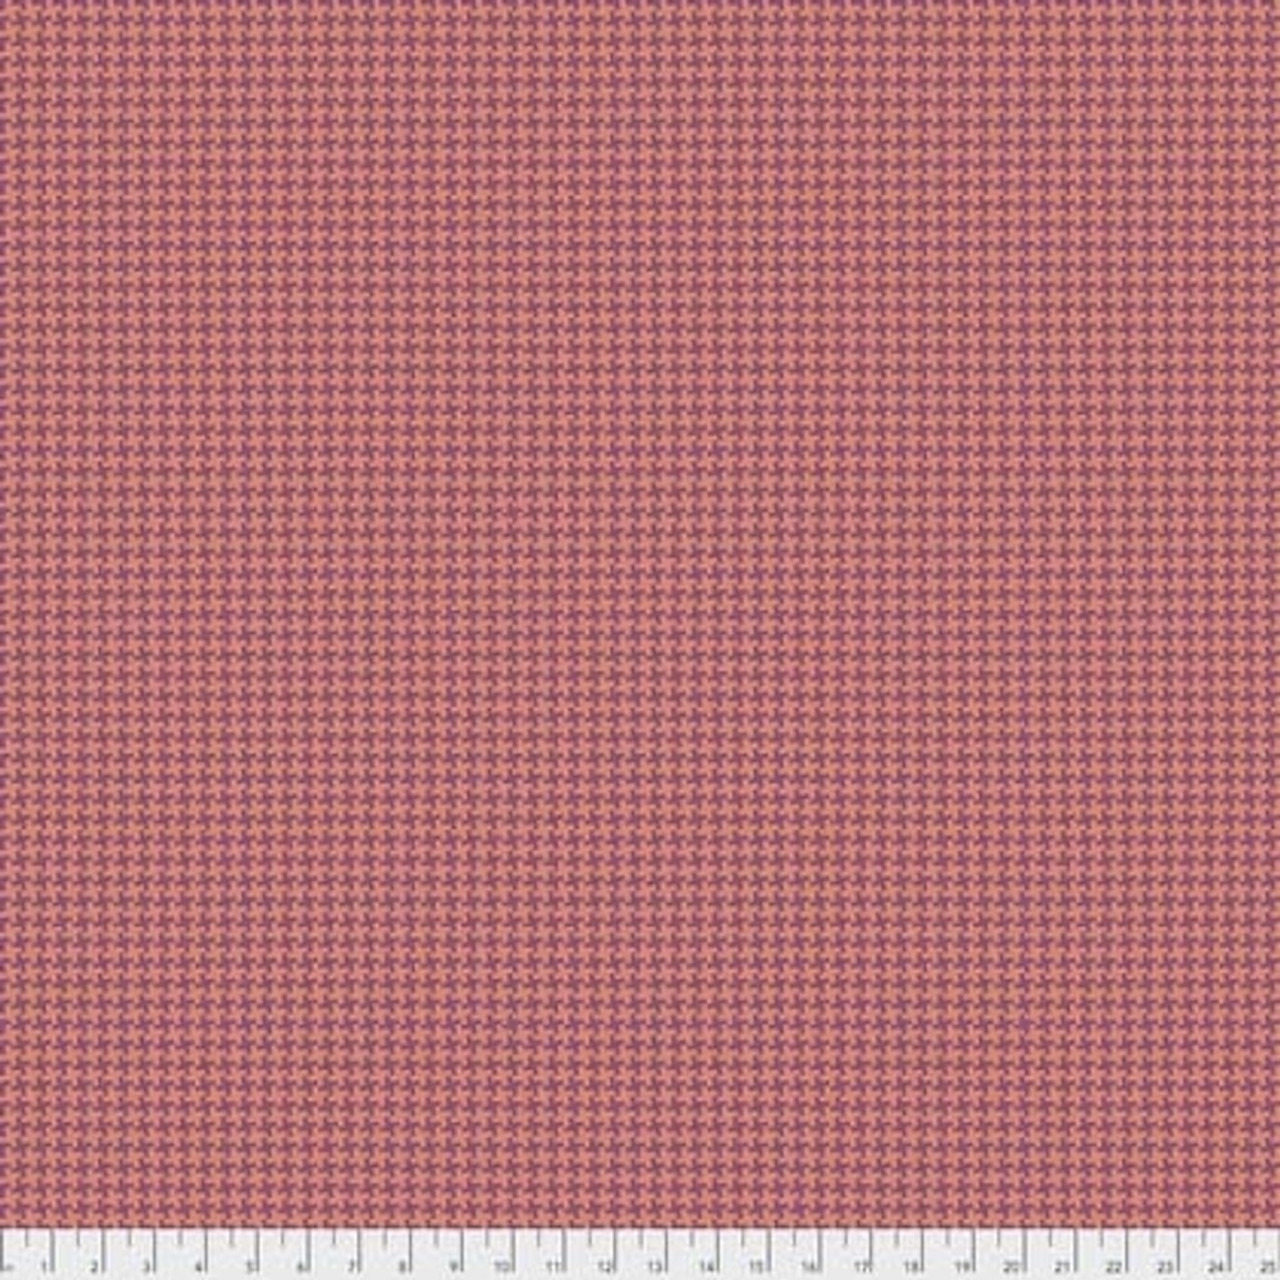 Joel Dewberry Avalon PWJD156 Houndstooth Orange Cotton Fabric By Yd